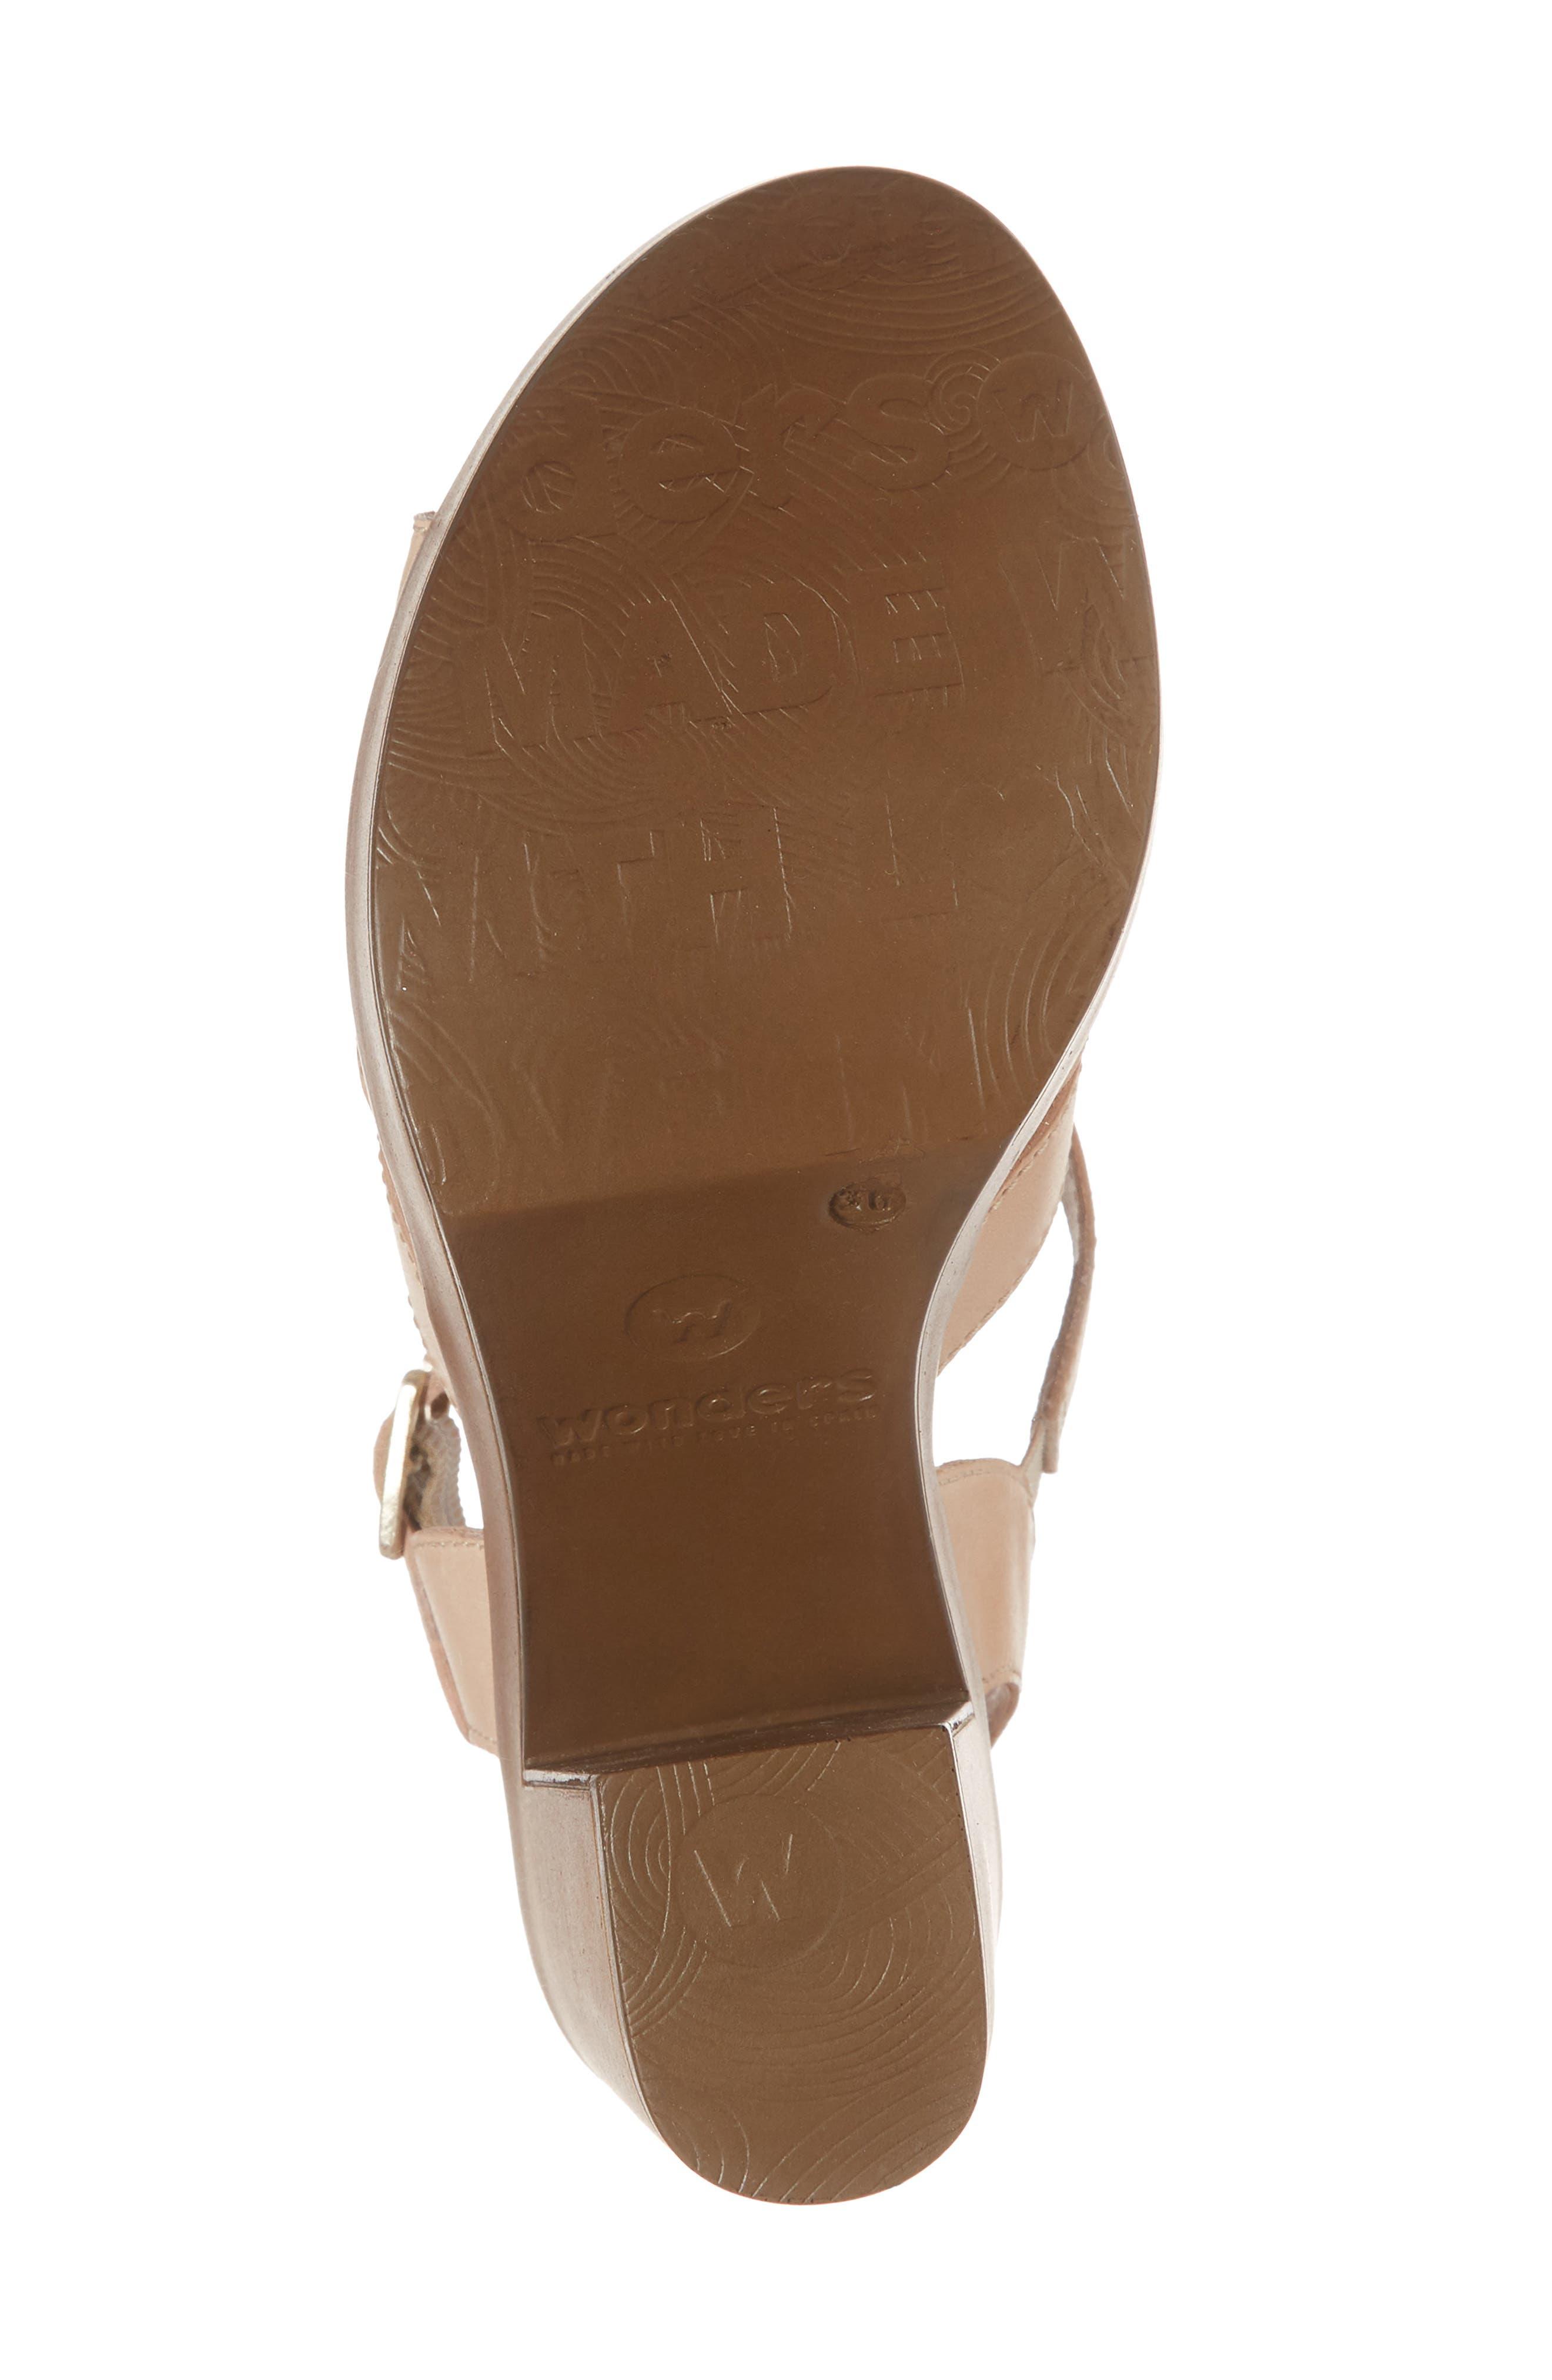 V-Strap Platform Sandal,                             Alternate thumbnail 6, color,                             Palo Leather